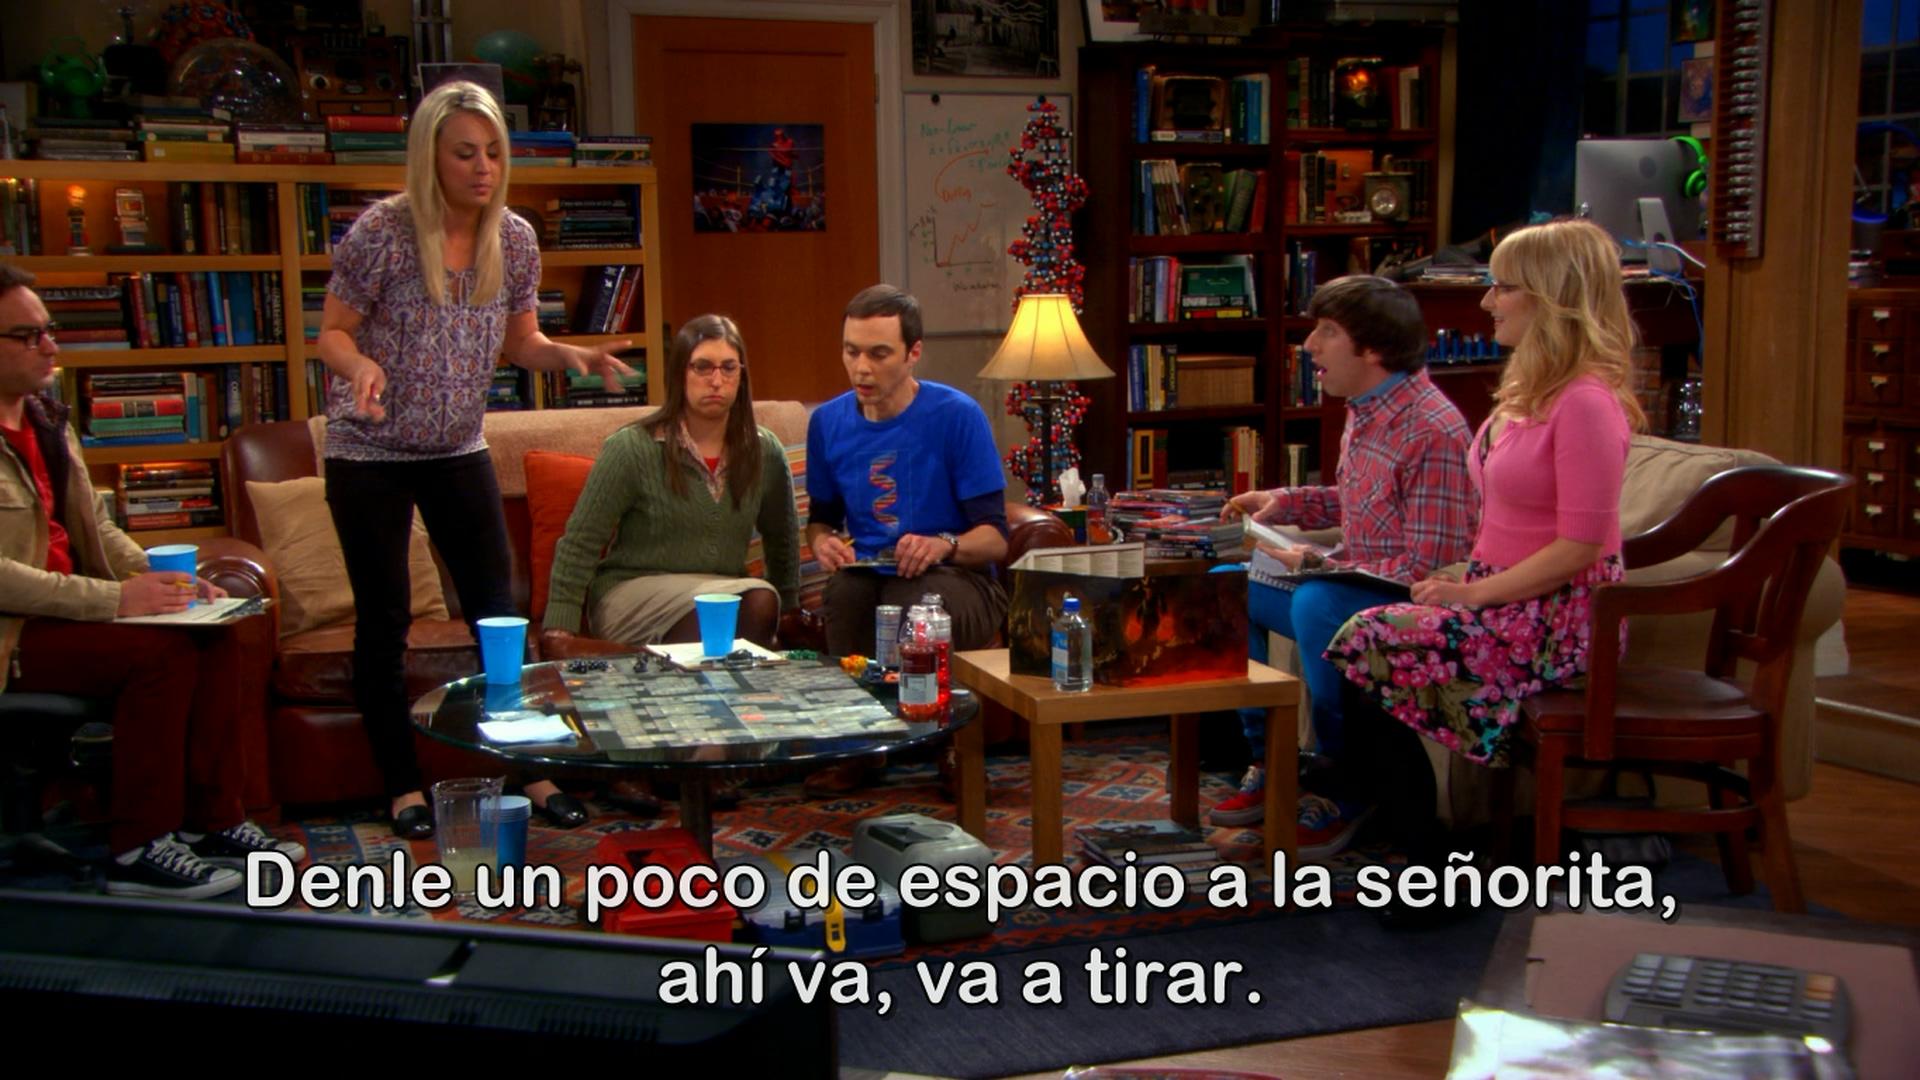 The Big Bang Theory S06 + Extras x265 10Bits 1080p